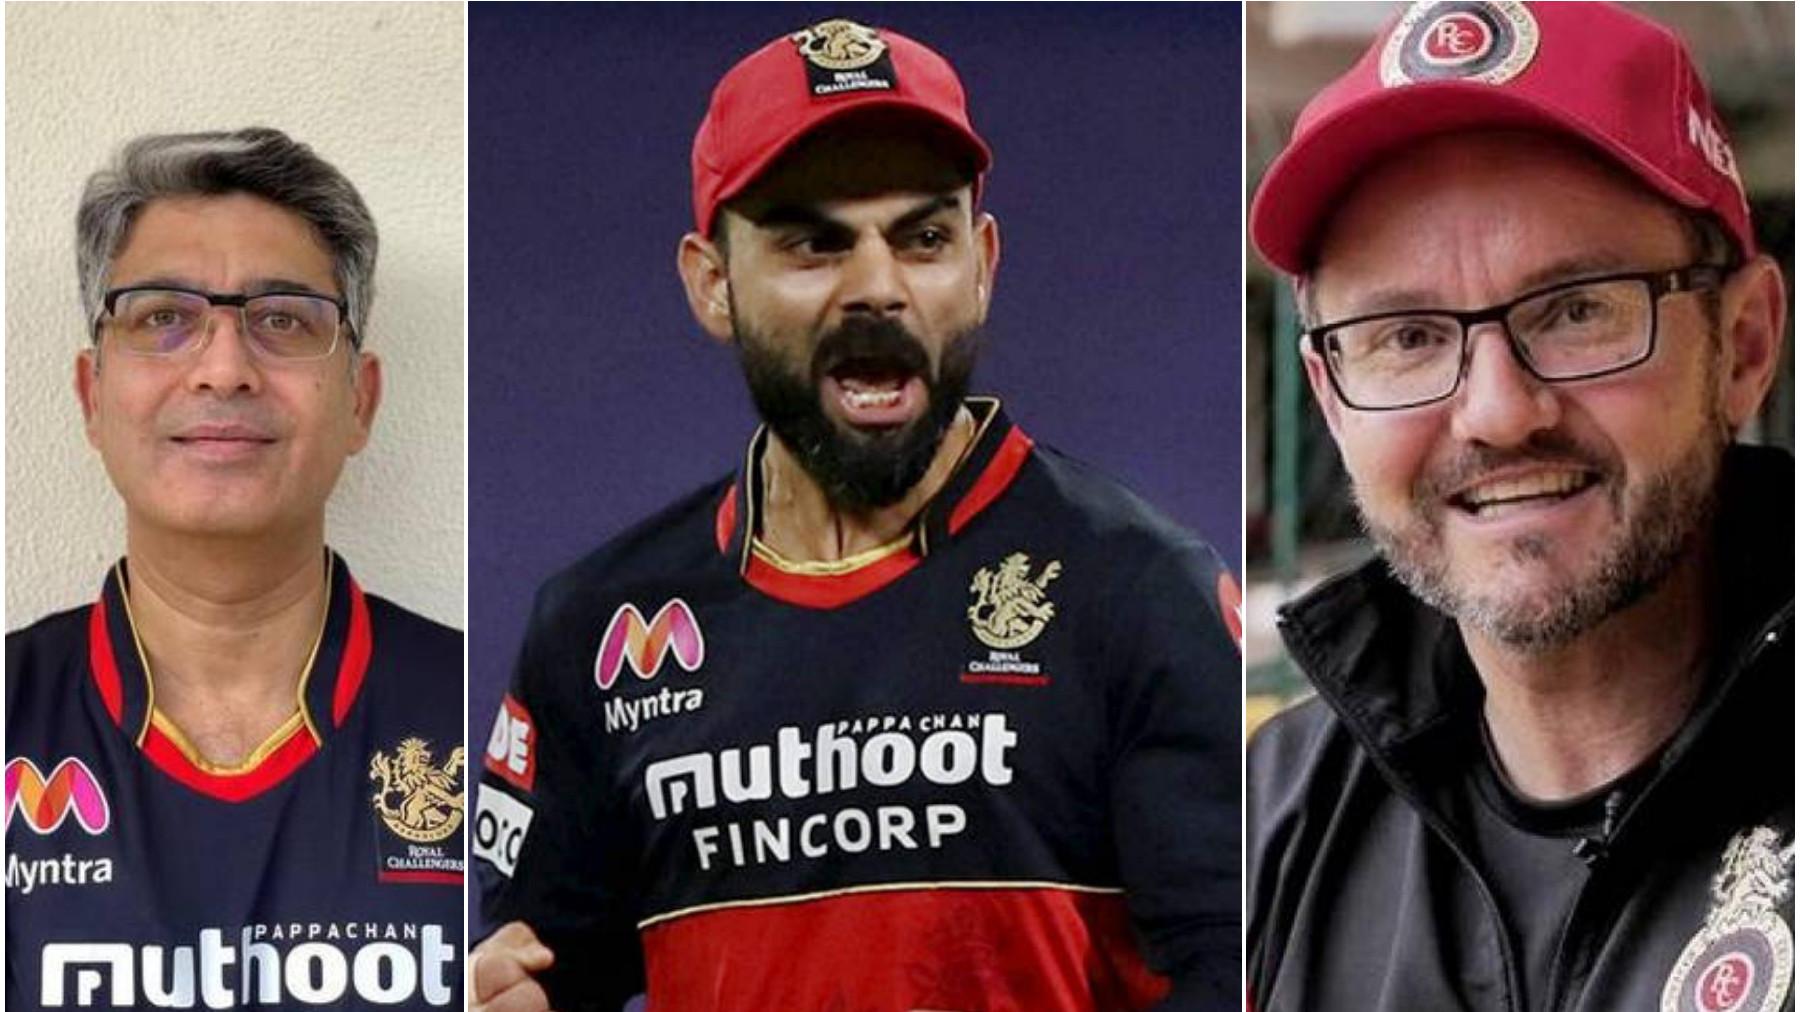 IPL 2021: RCB chairman Prathmesh Mishra and coach Mike Hesson react to Virat Kohli quitting captaincy